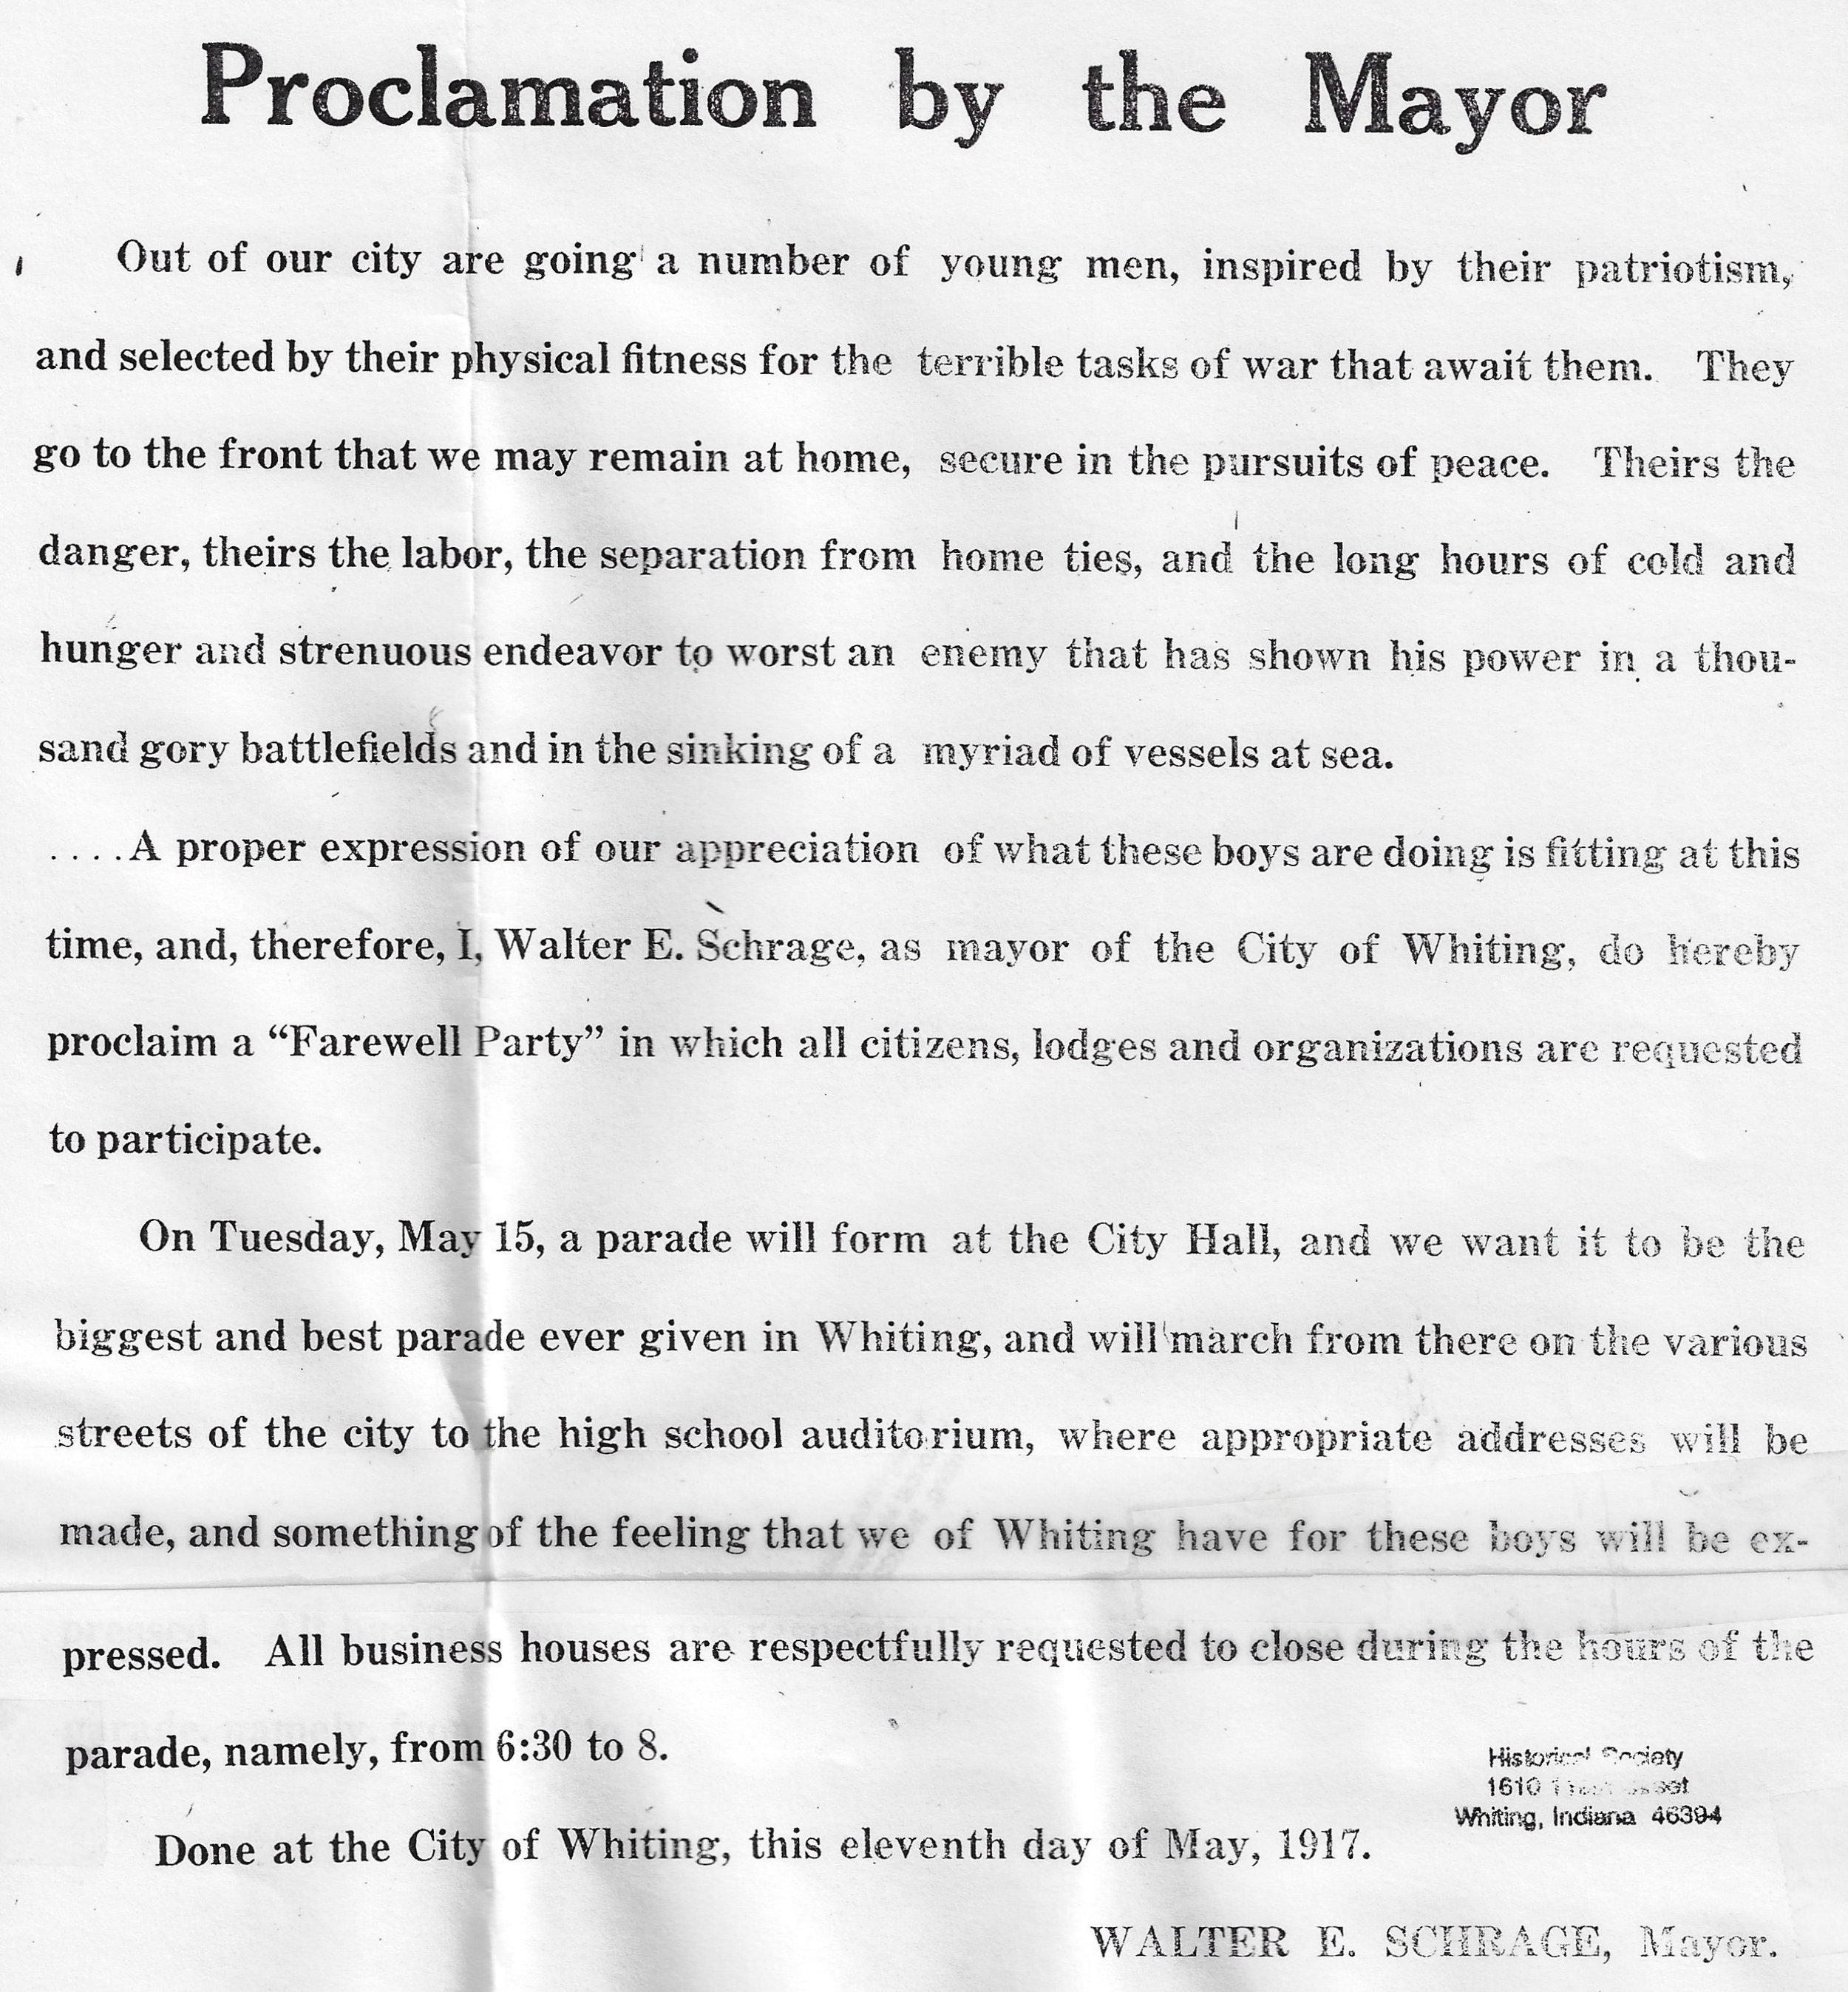 Proclamation.bmp.jpg